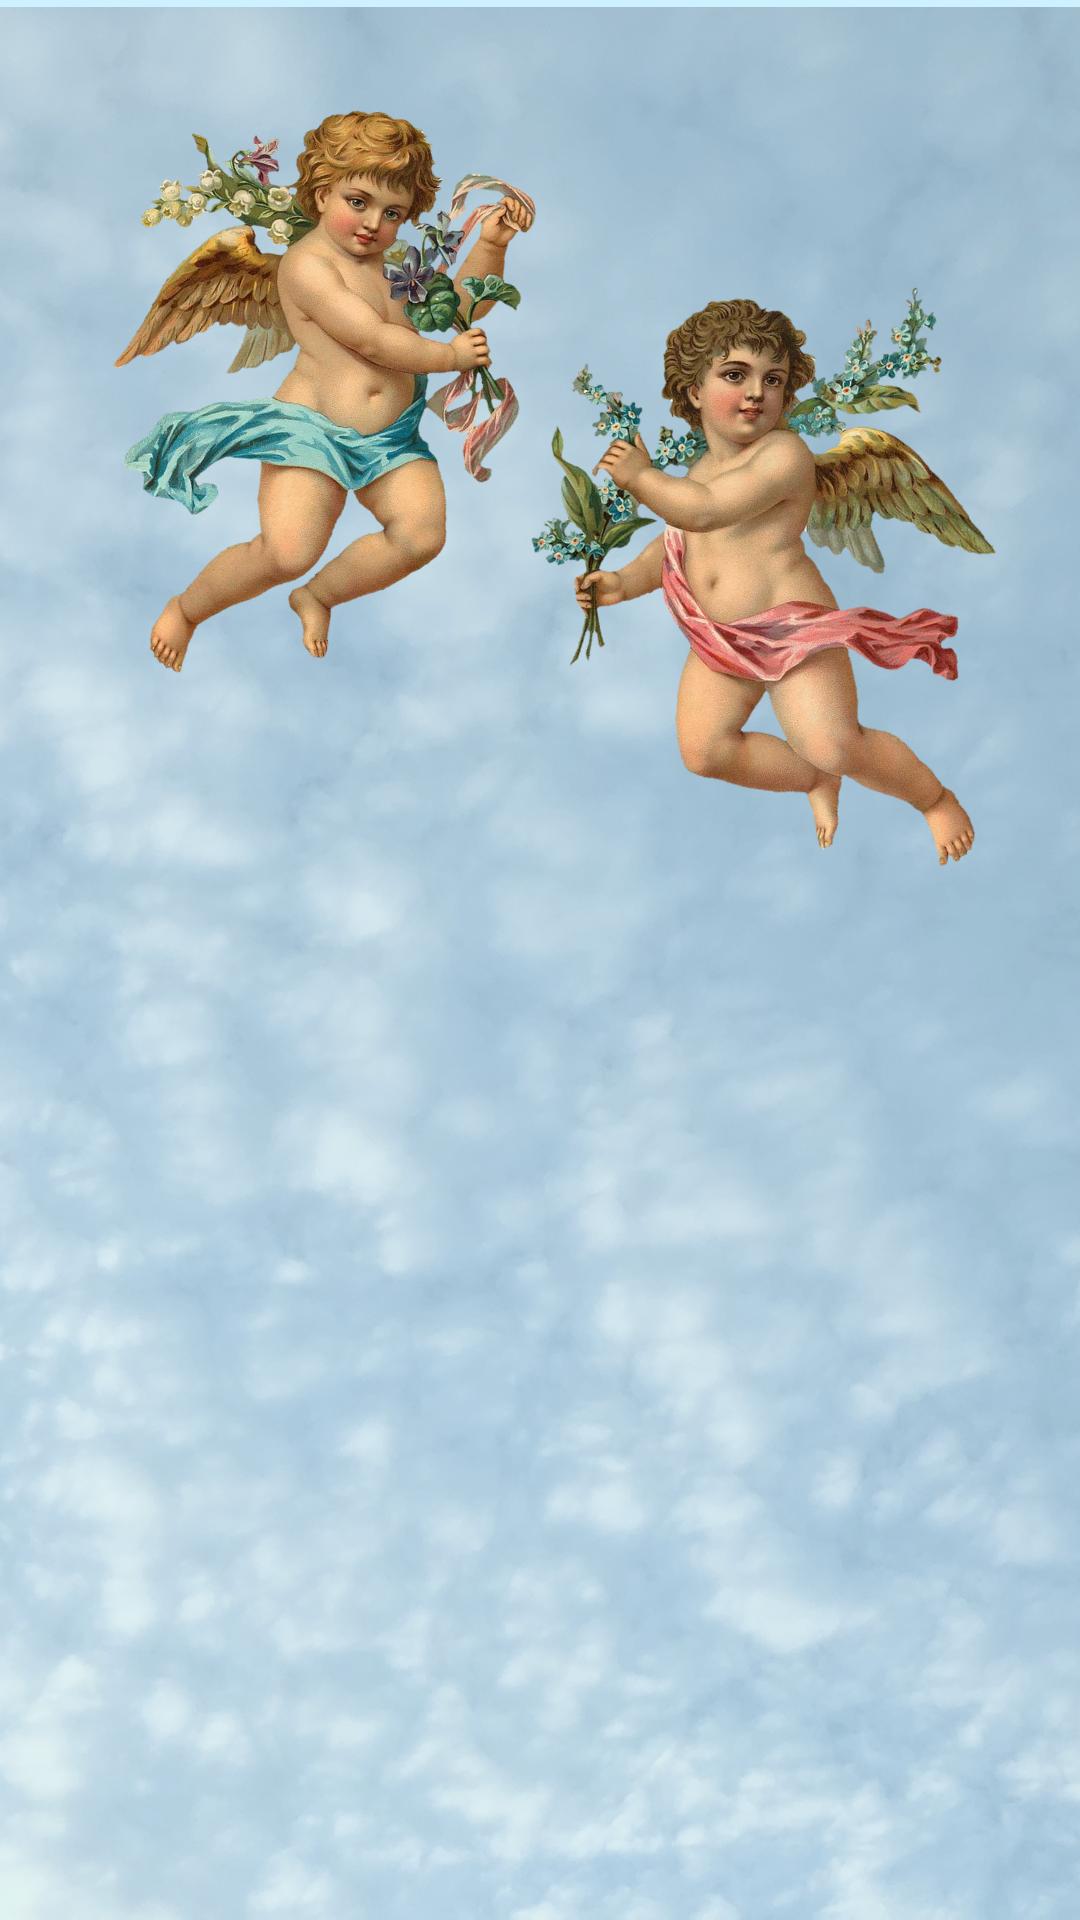 Cherub wallpaper Angel wallpaper Art wallpaper iphone Angel 1080x1920